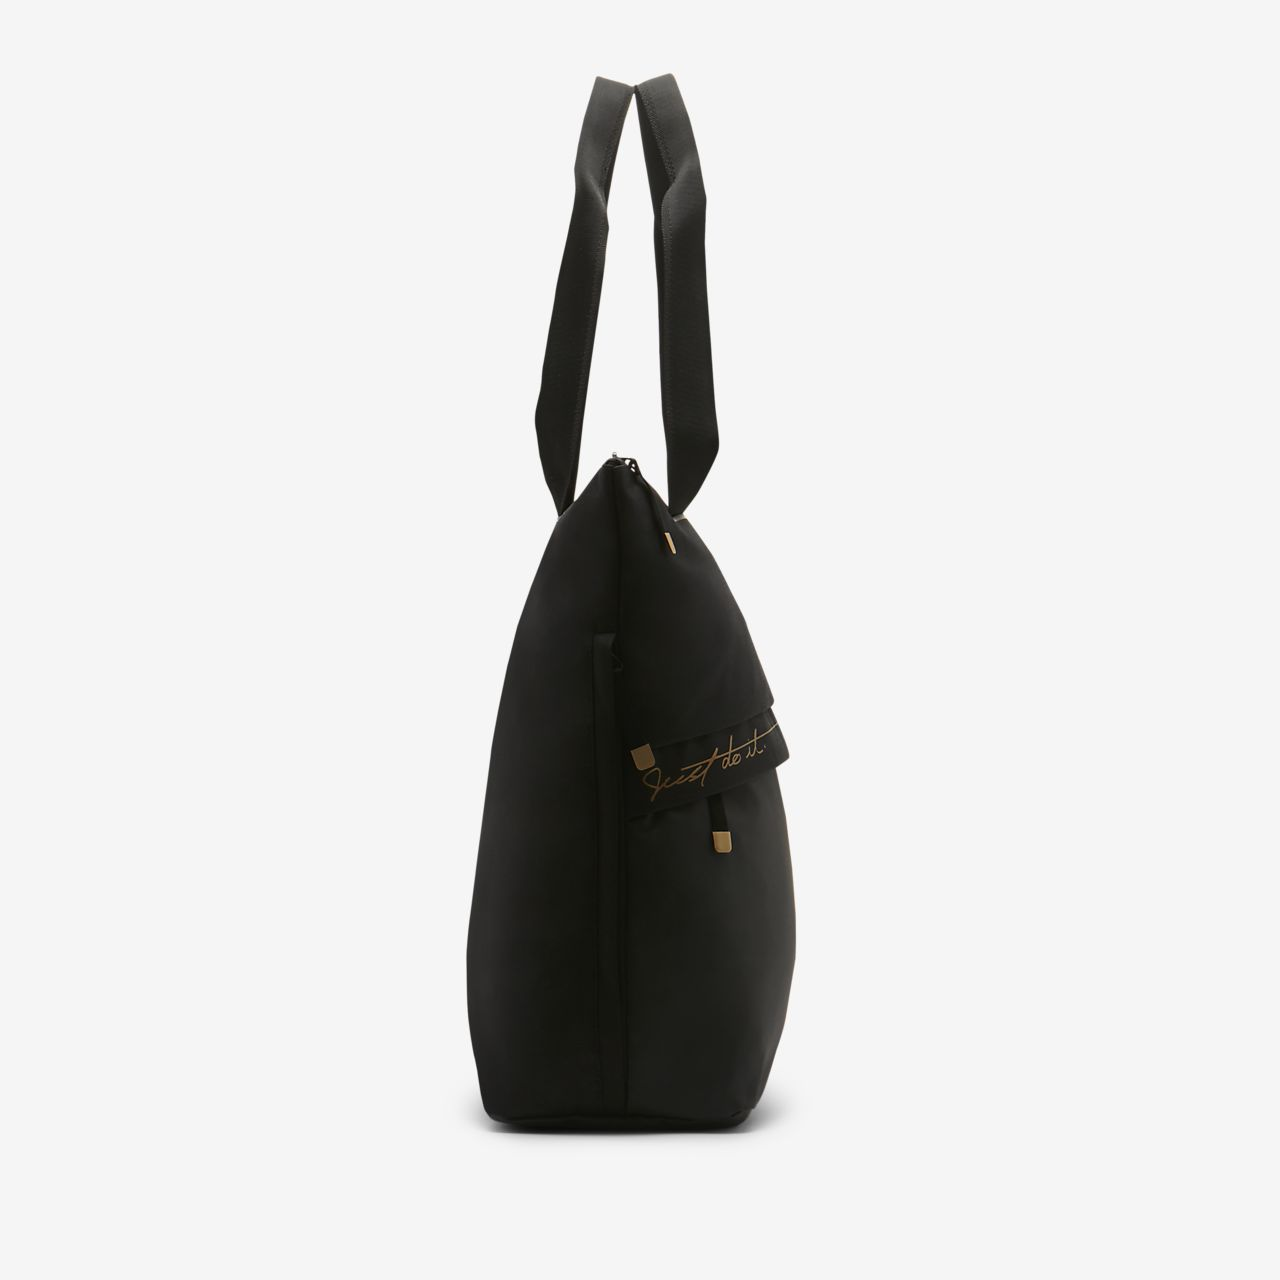 ced11be8d1 Tote bag de training à motif Nike Radiate pour Femme. Nike.com BE